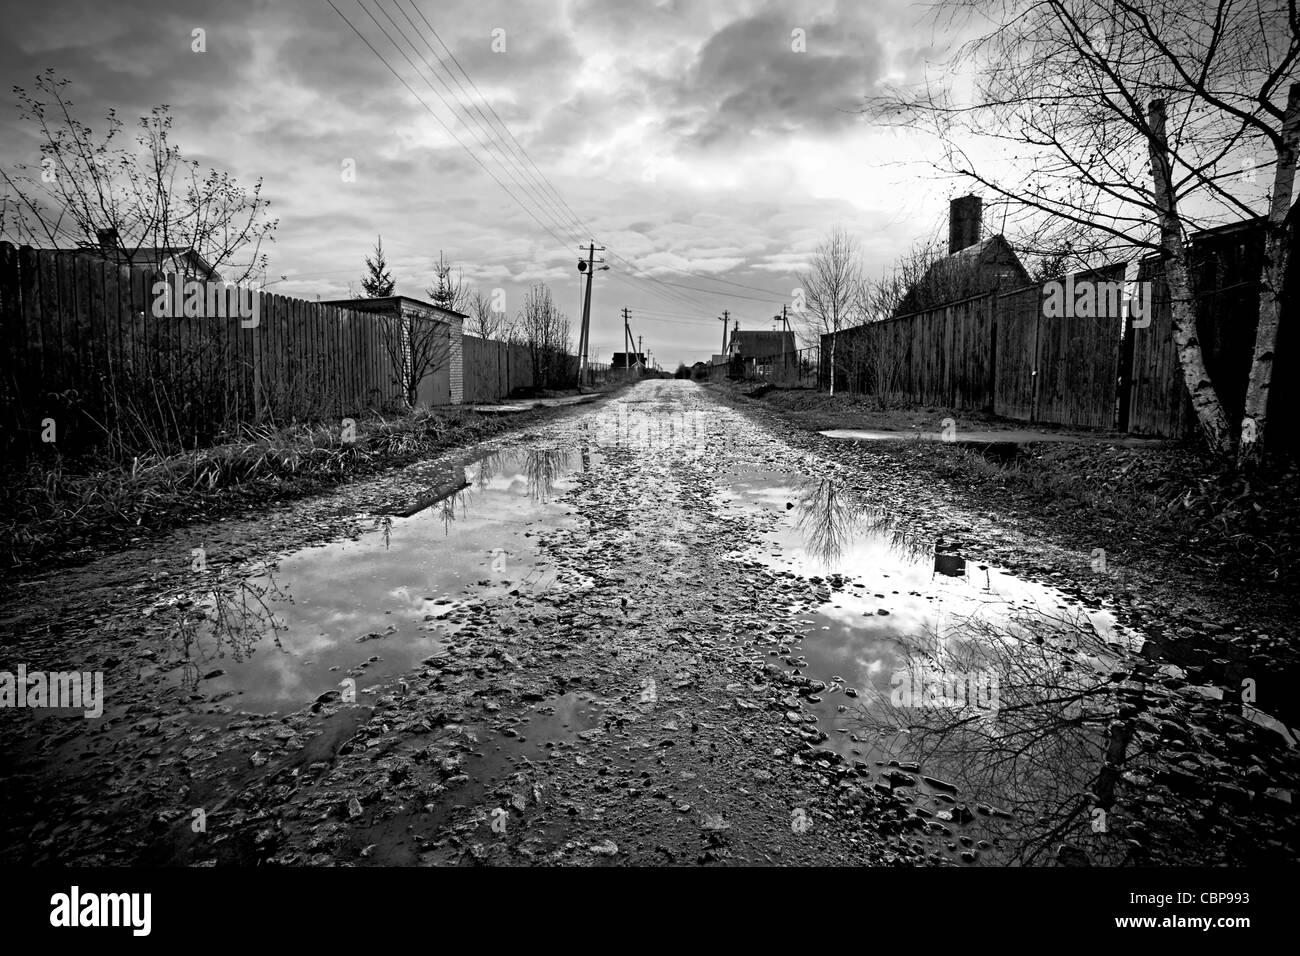 Rainy season. Rural pictures. B&W processing. - Stock Image